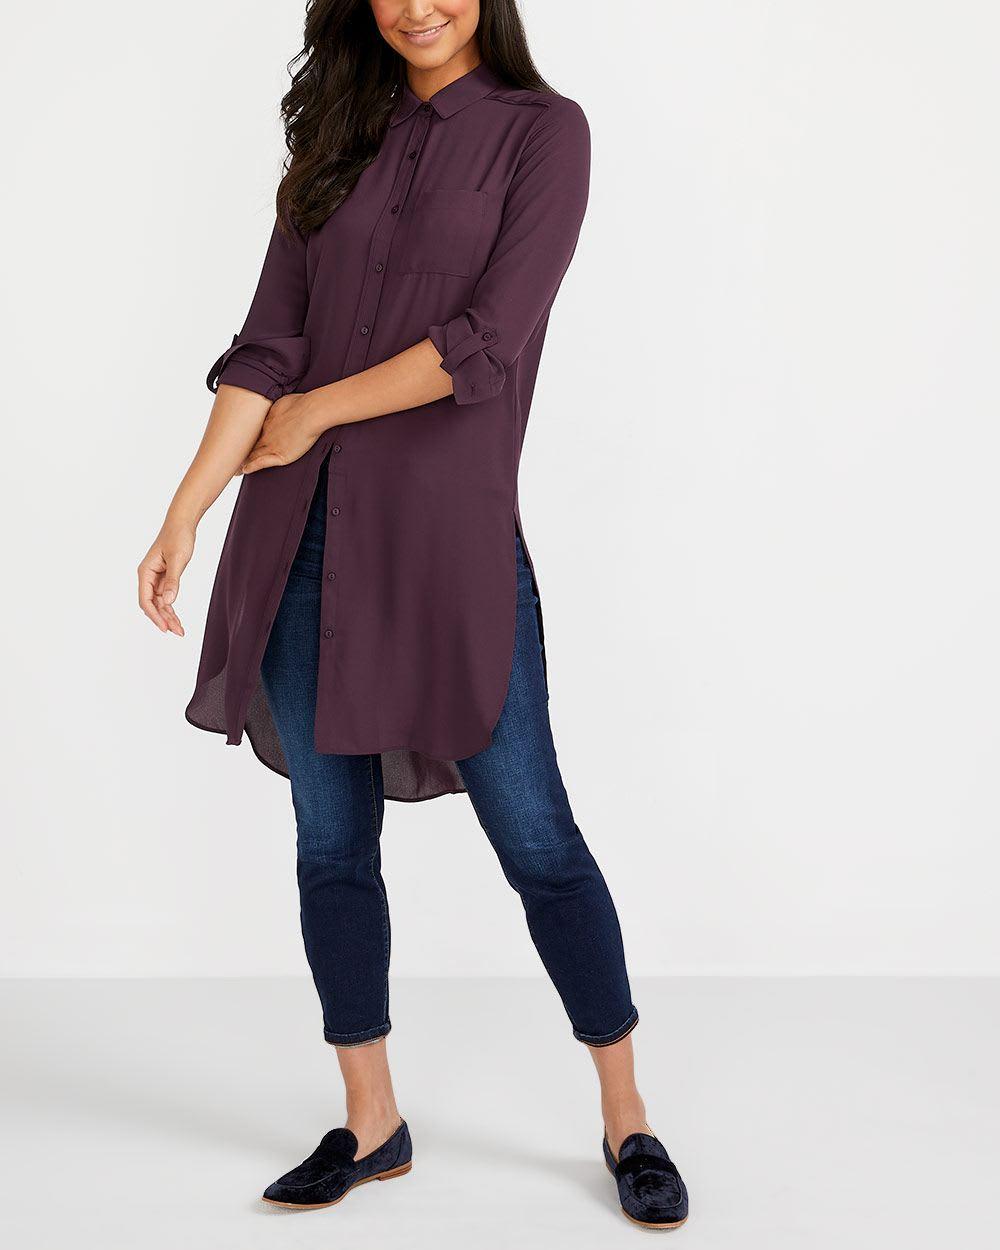 Adjustable Sleeve Tunic Shirt